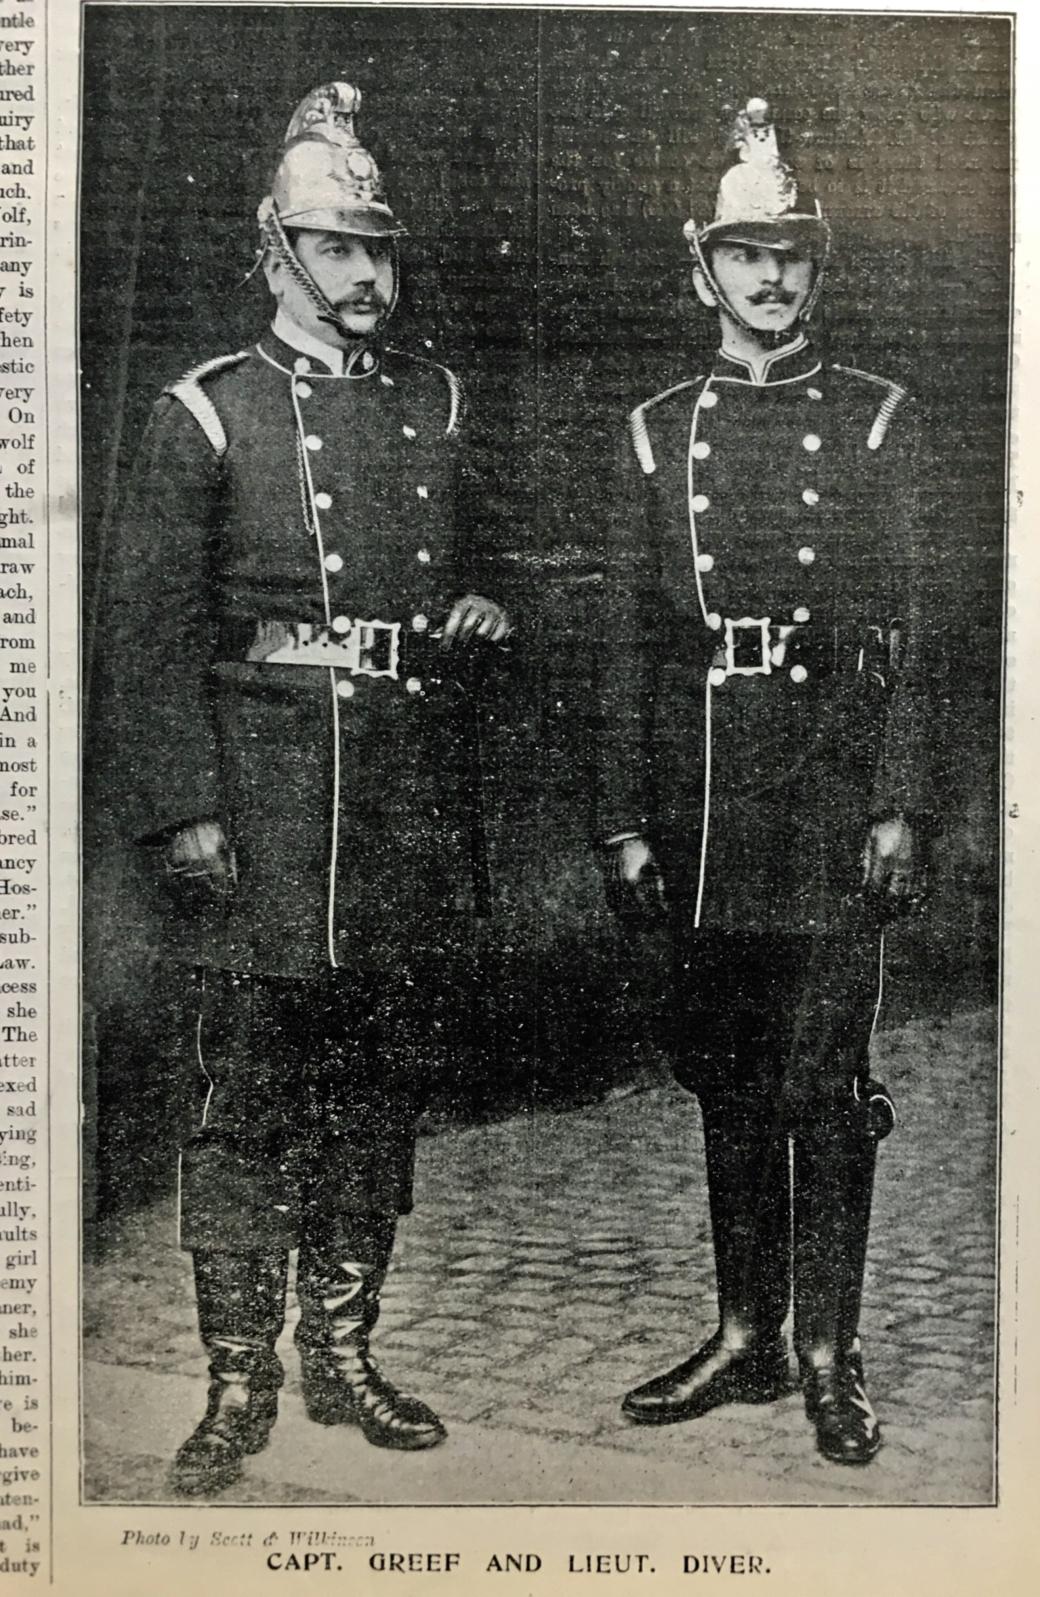 CBG Graphic Cambridge Fire Brigade 1900 Capt Greef Lt Diver.jpg